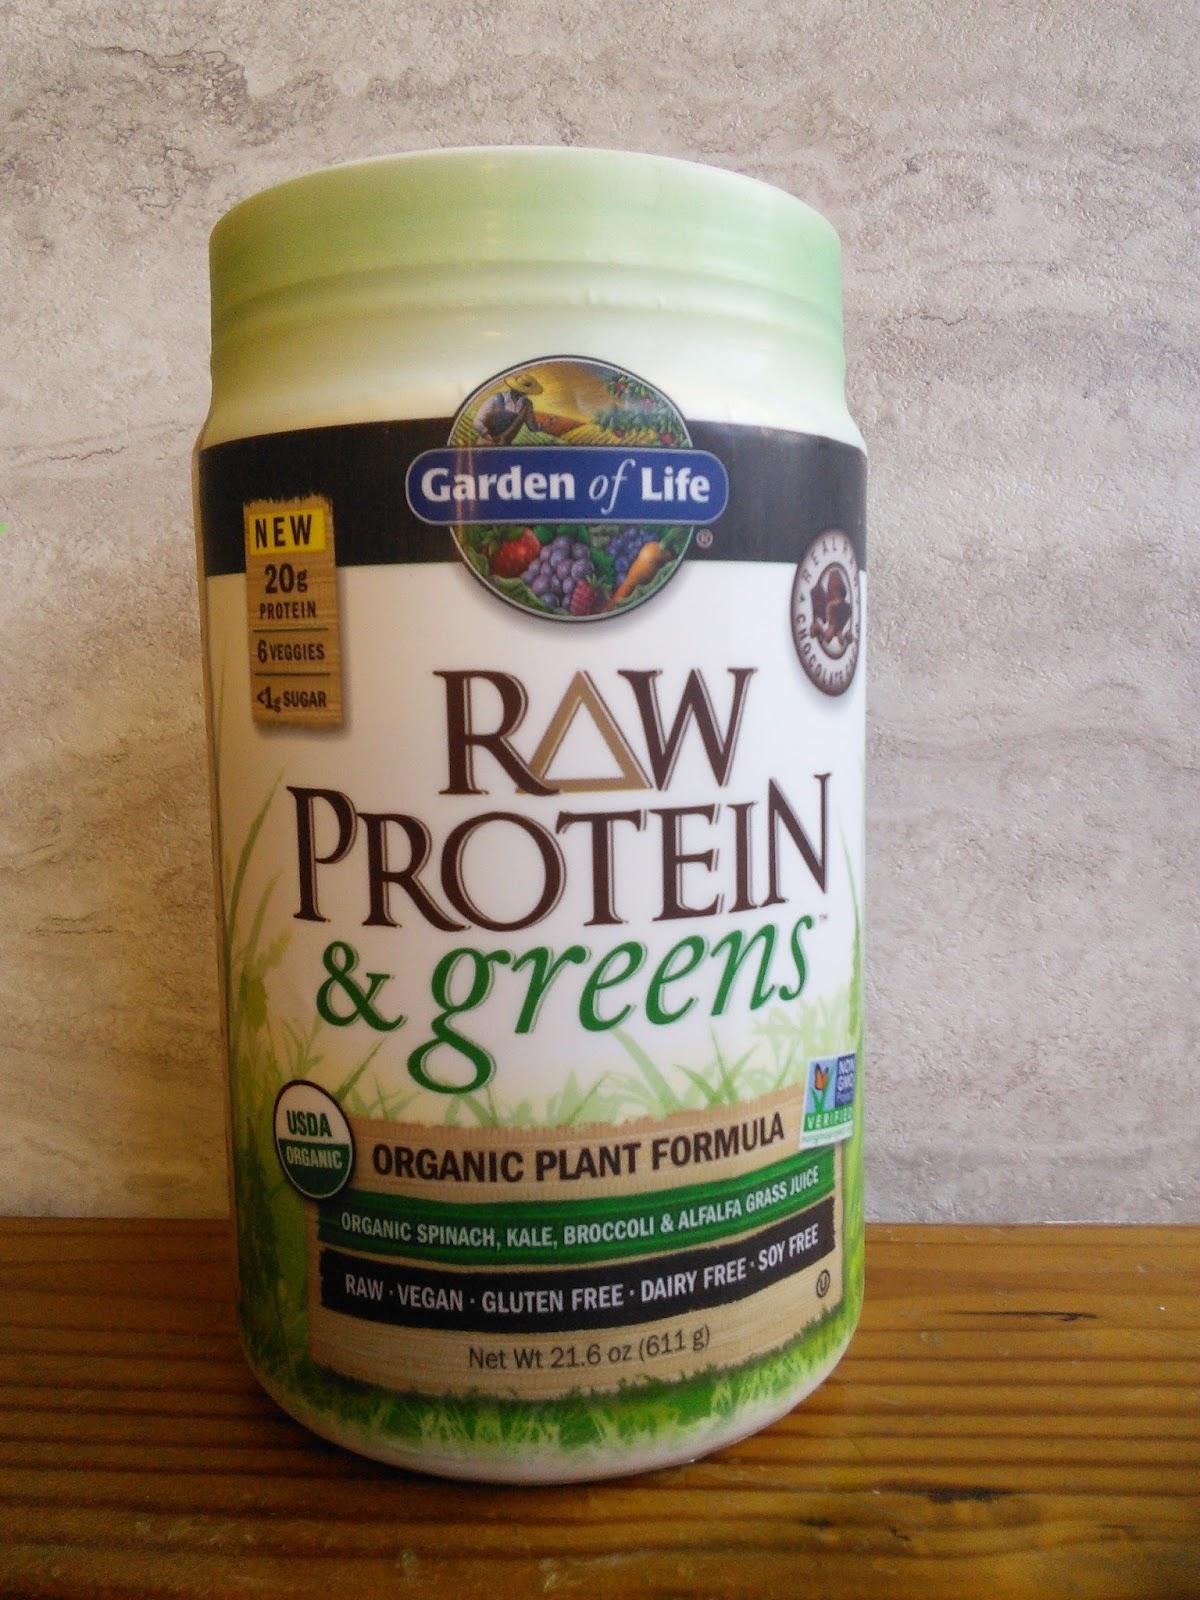 of for garden evitaminscom vcapsules eden amazoncom multivitamin women vitamin defense primal vitamins code life